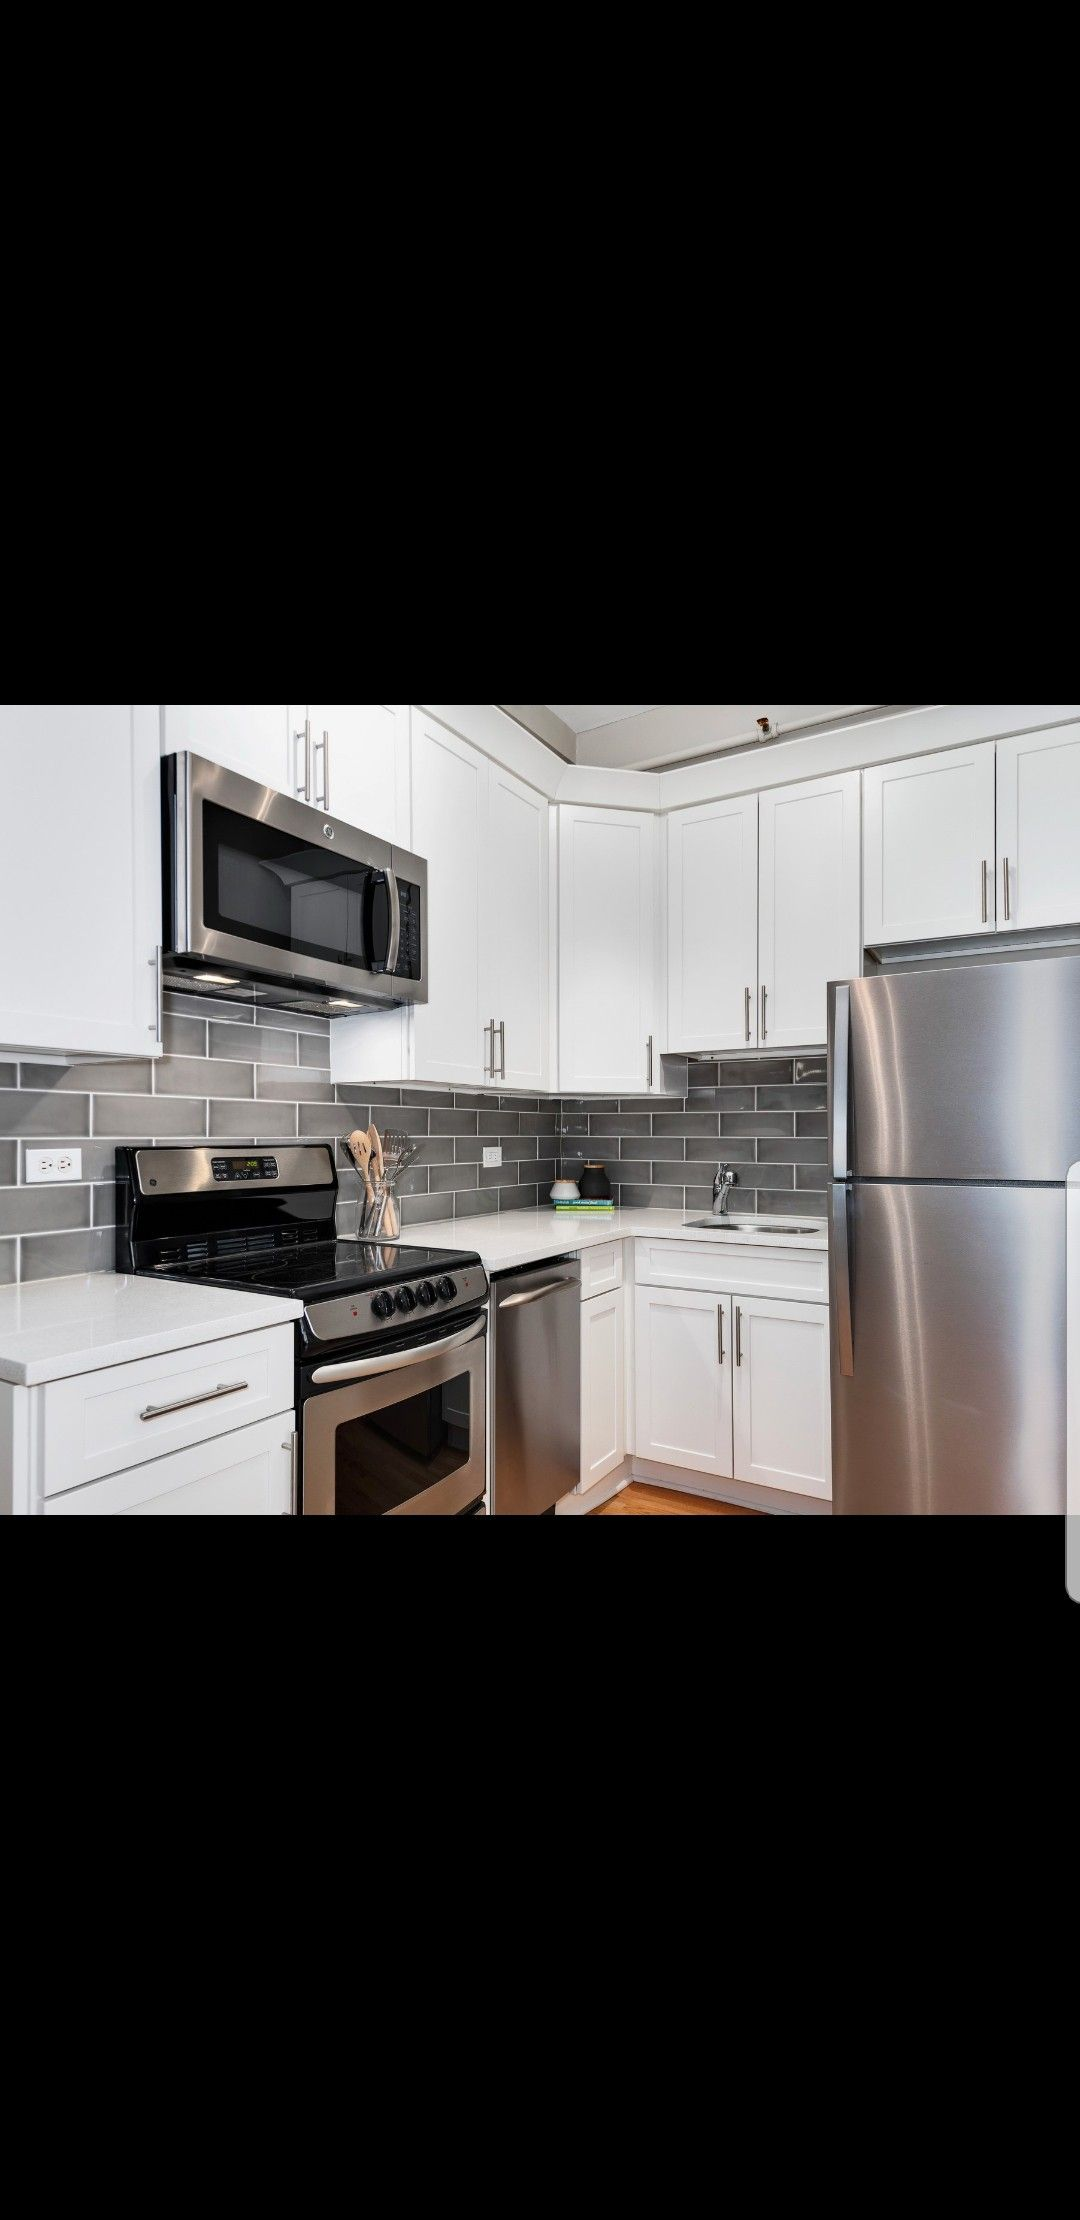 Modern Kitchen With White Cabinets Stainless Steel Appliances Grey Subway Tile Backsplash White Kitchen Rustic White Kitchen Countertops White Kitchen Decor